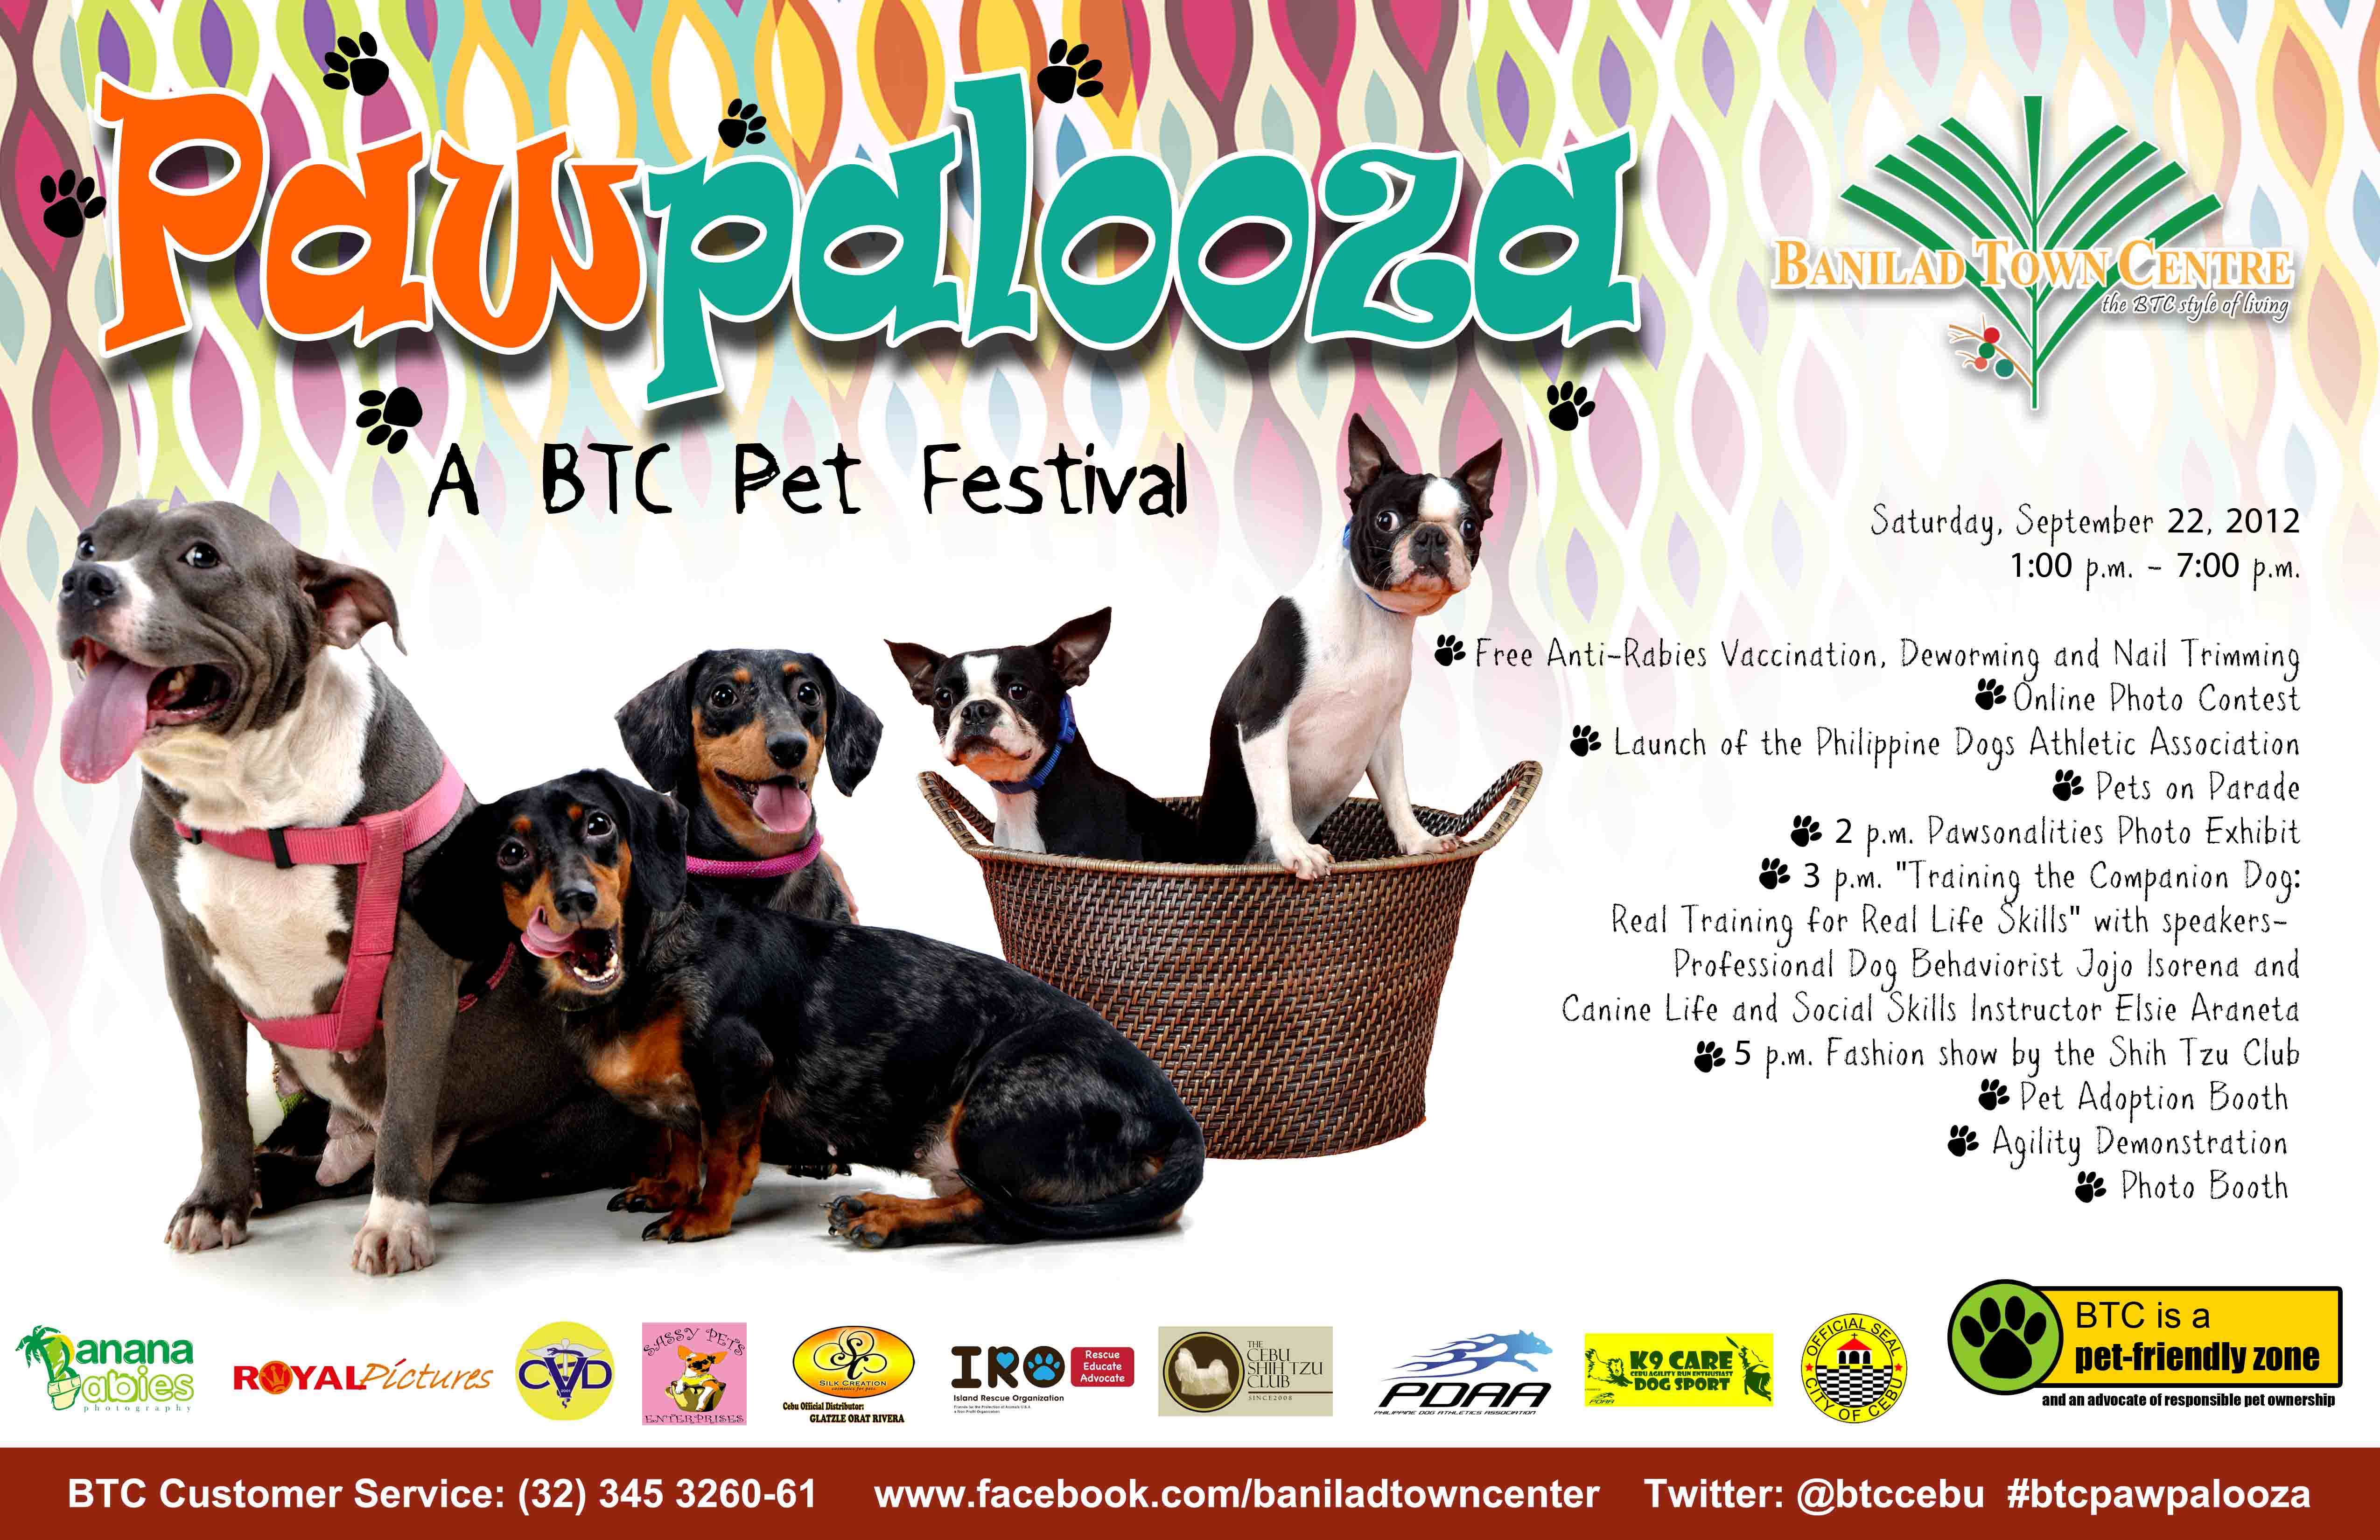 Pawpalooza Pet Festival at BTC Cebu